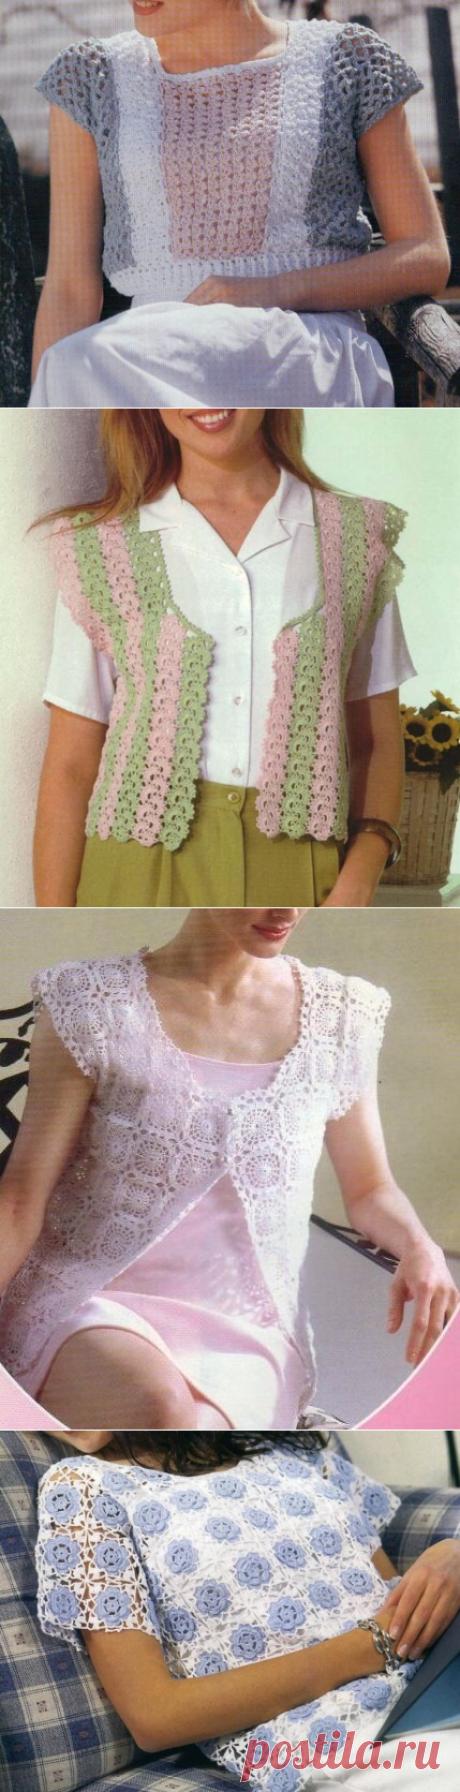 Подборка летних маек, топов, кофточек крючком, со схемами | Sana Lace Knit | Яндекс Дзен